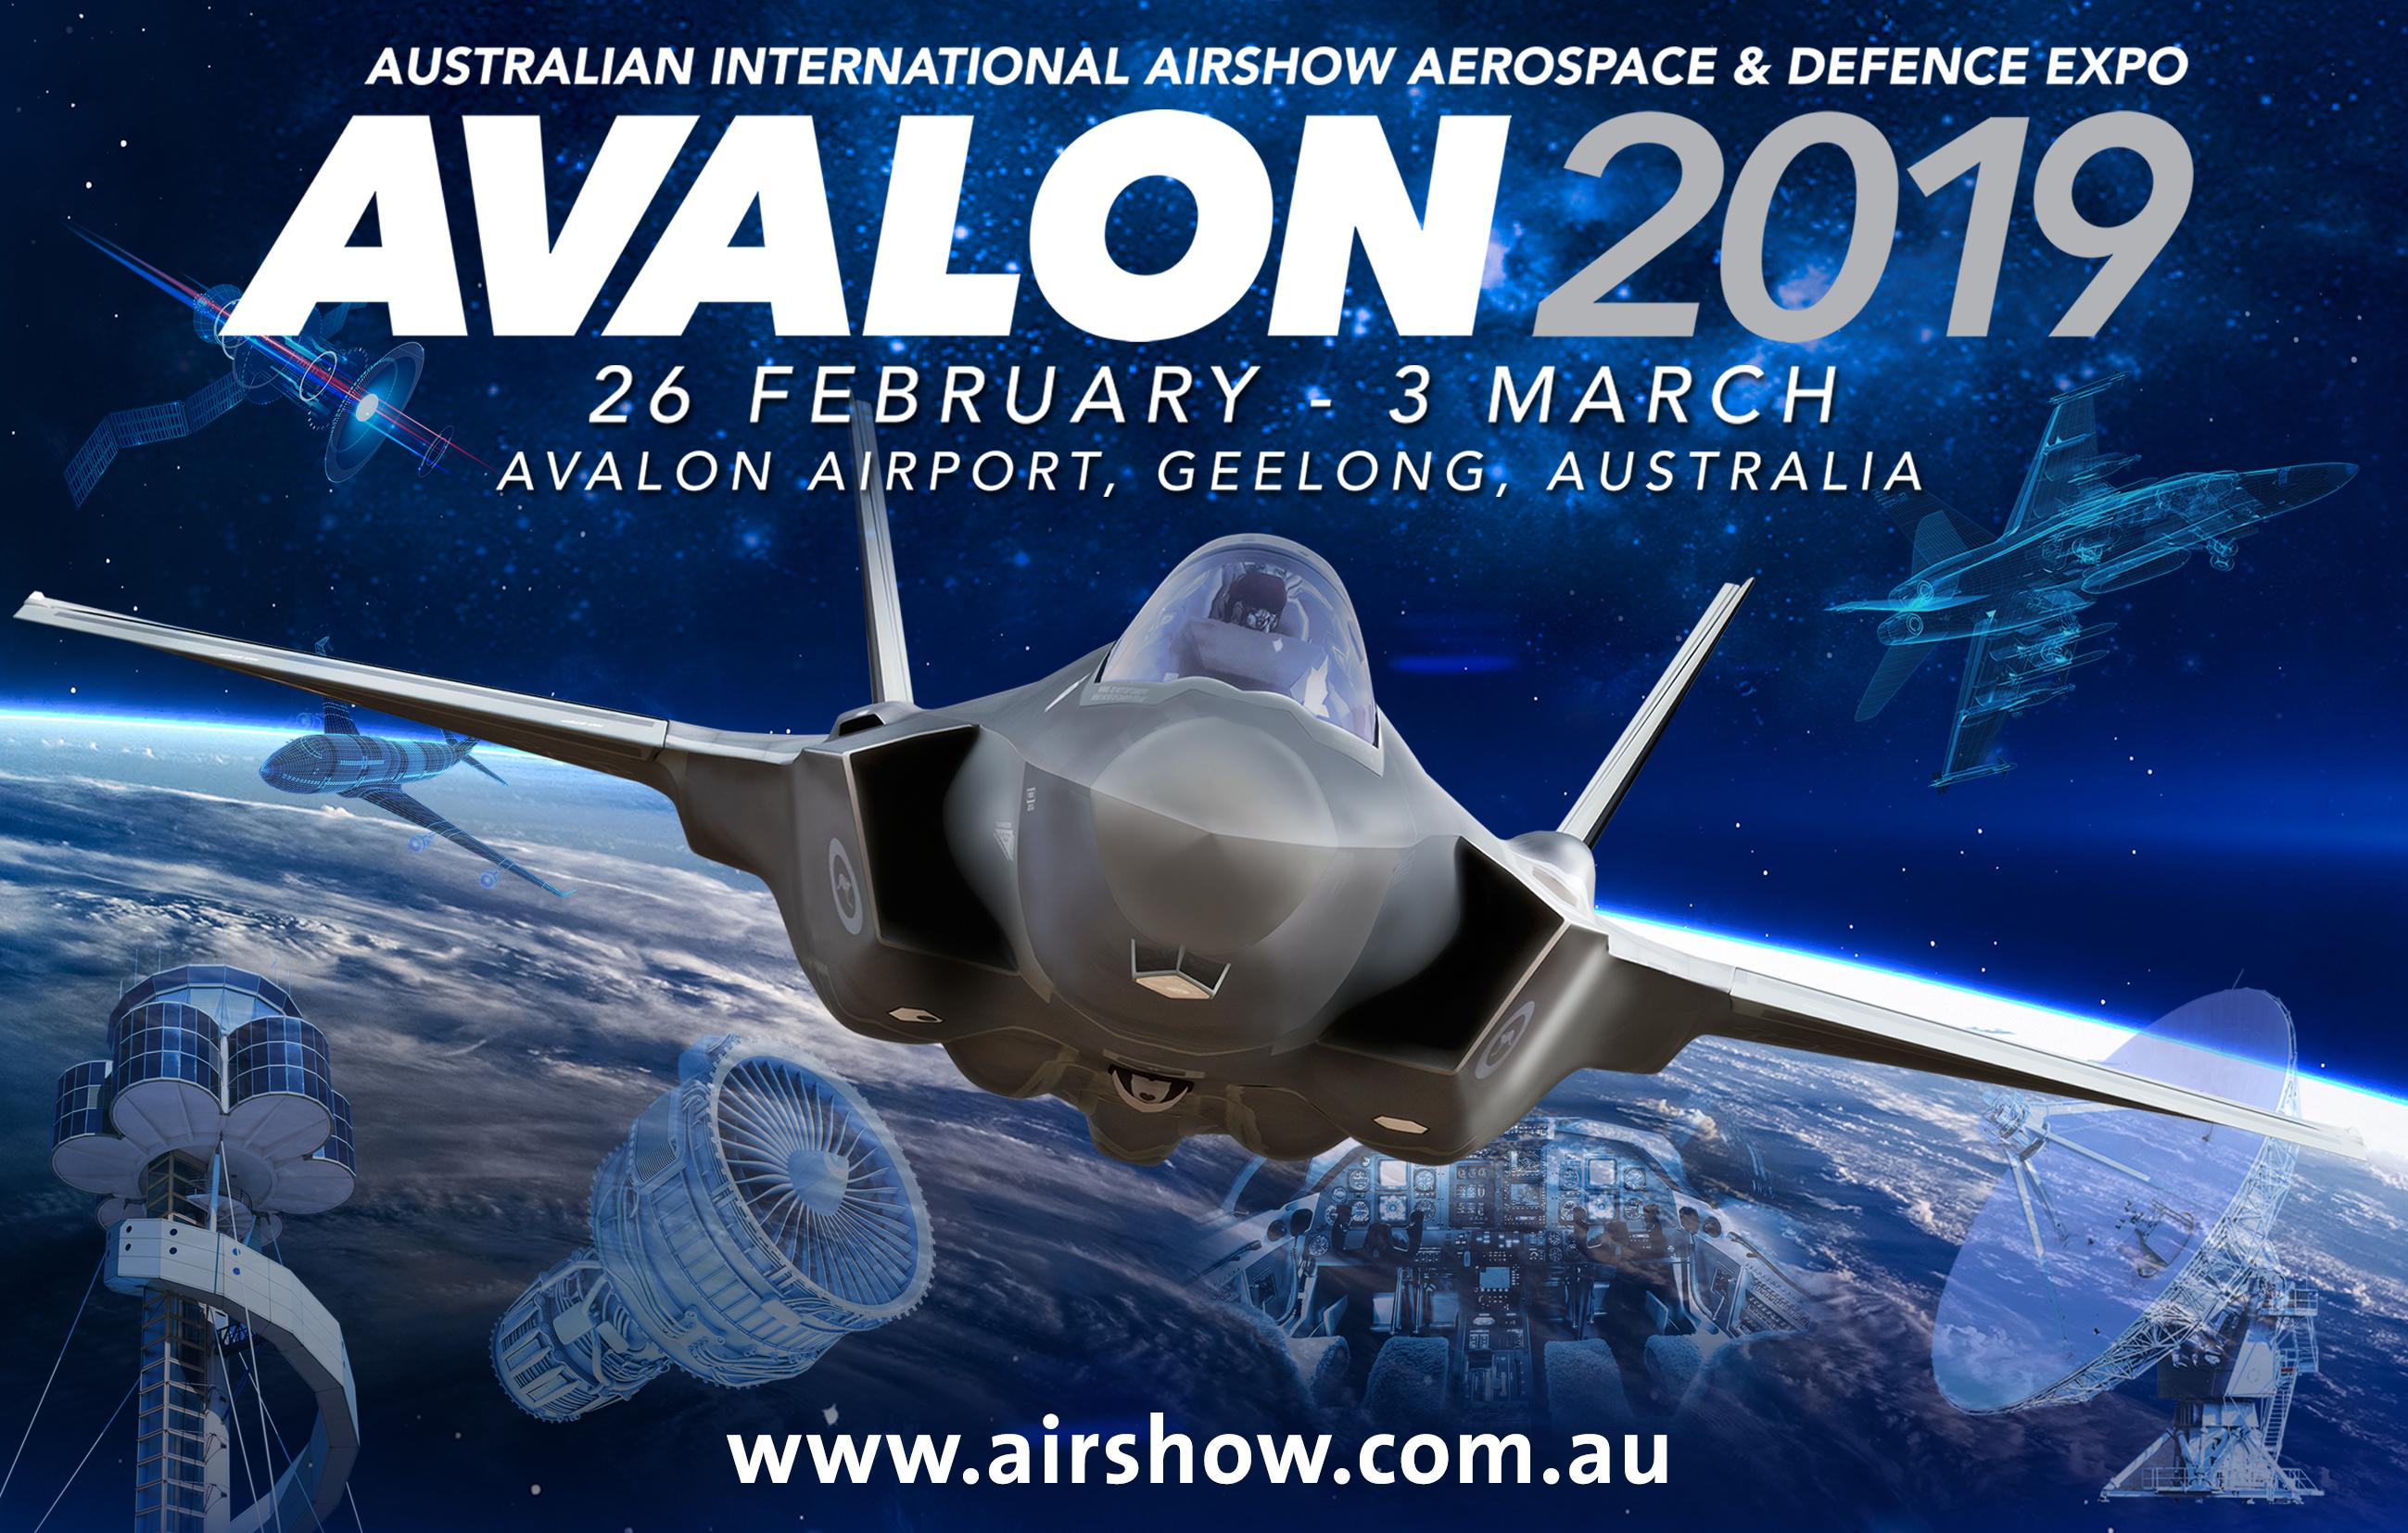 Australian International Airshow 2019, Military Displays